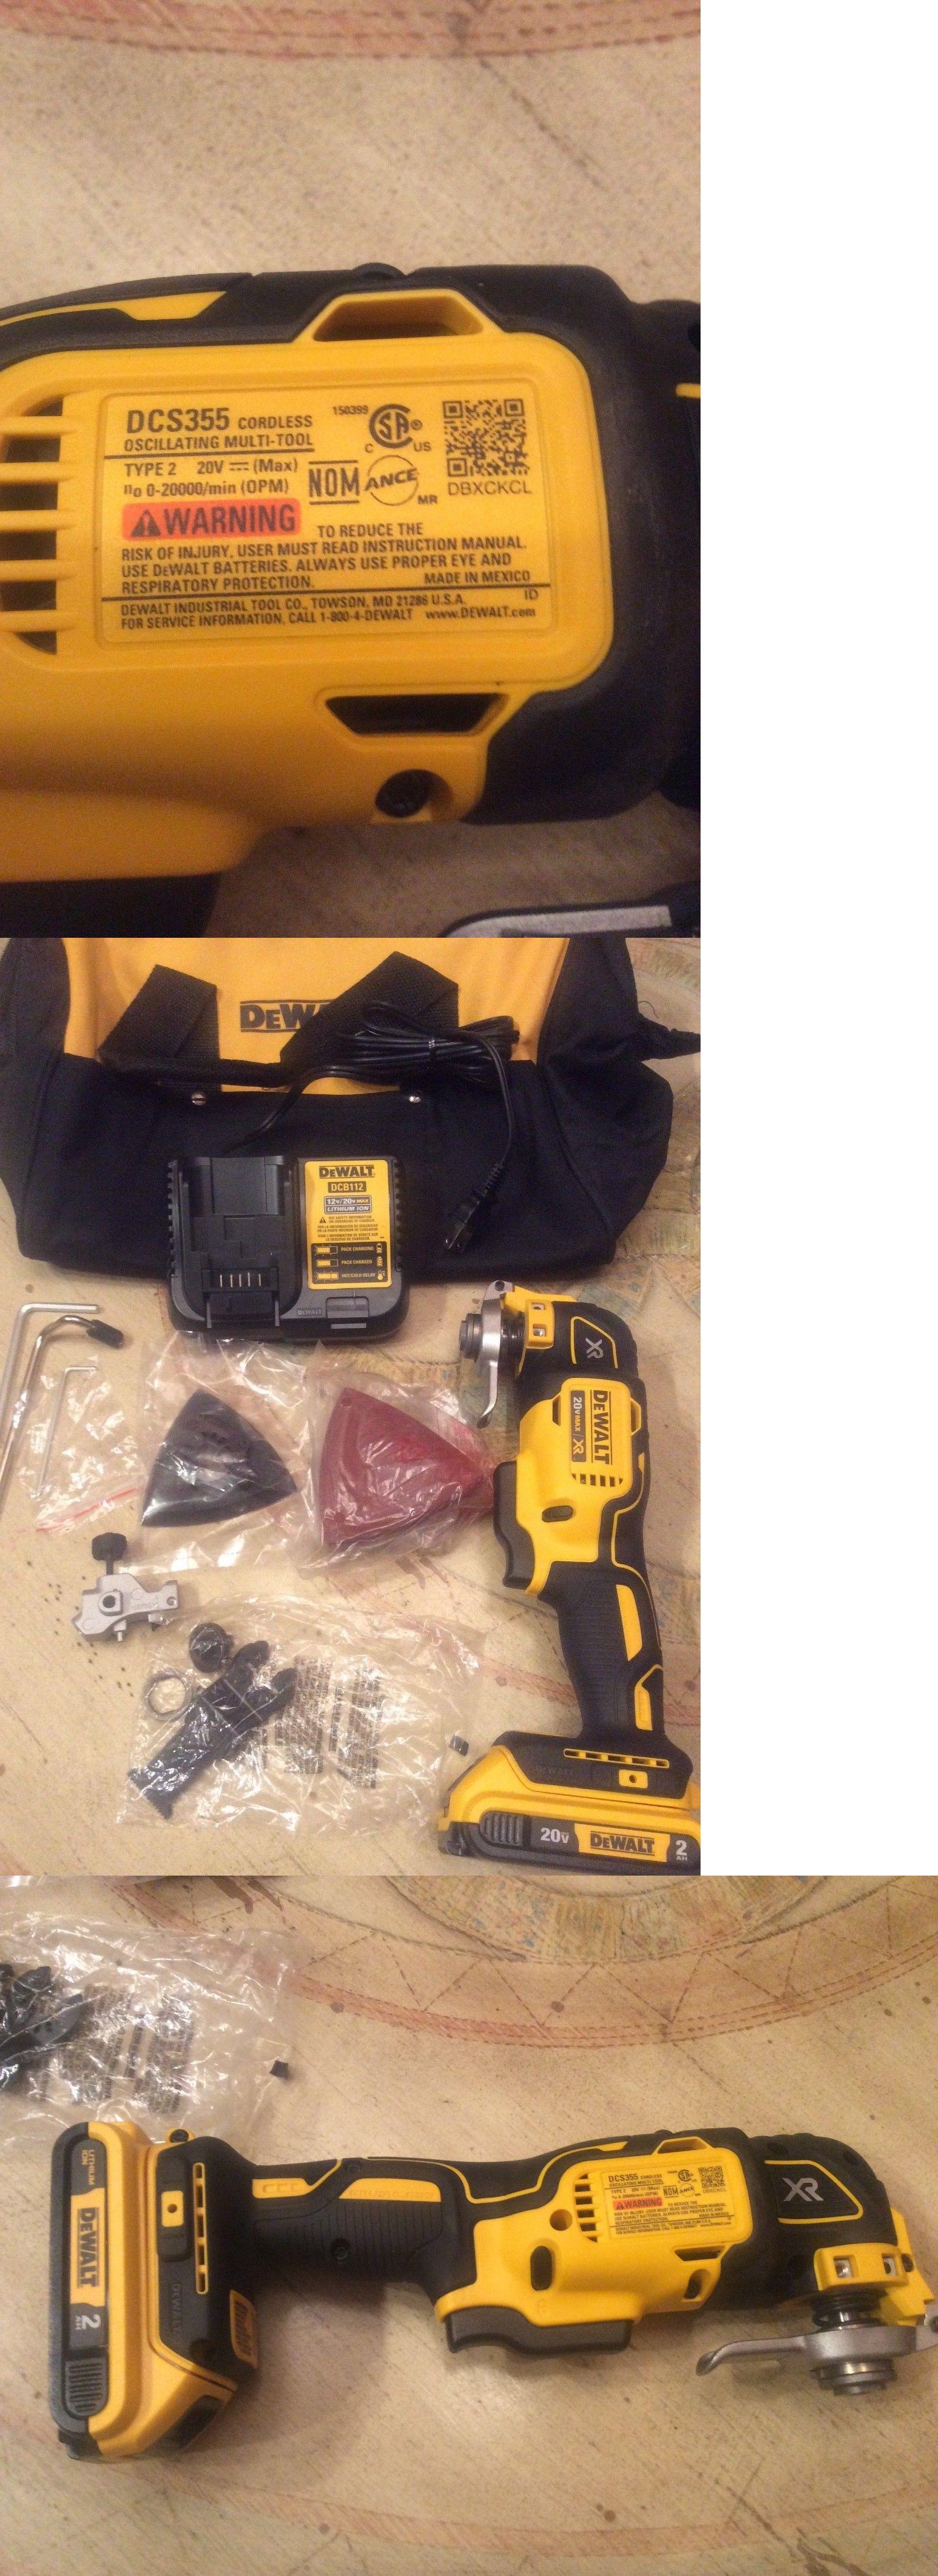 Power Tool Sets 177000 Dewalt Dcs355d1 20v Max Xr Lithium Ion